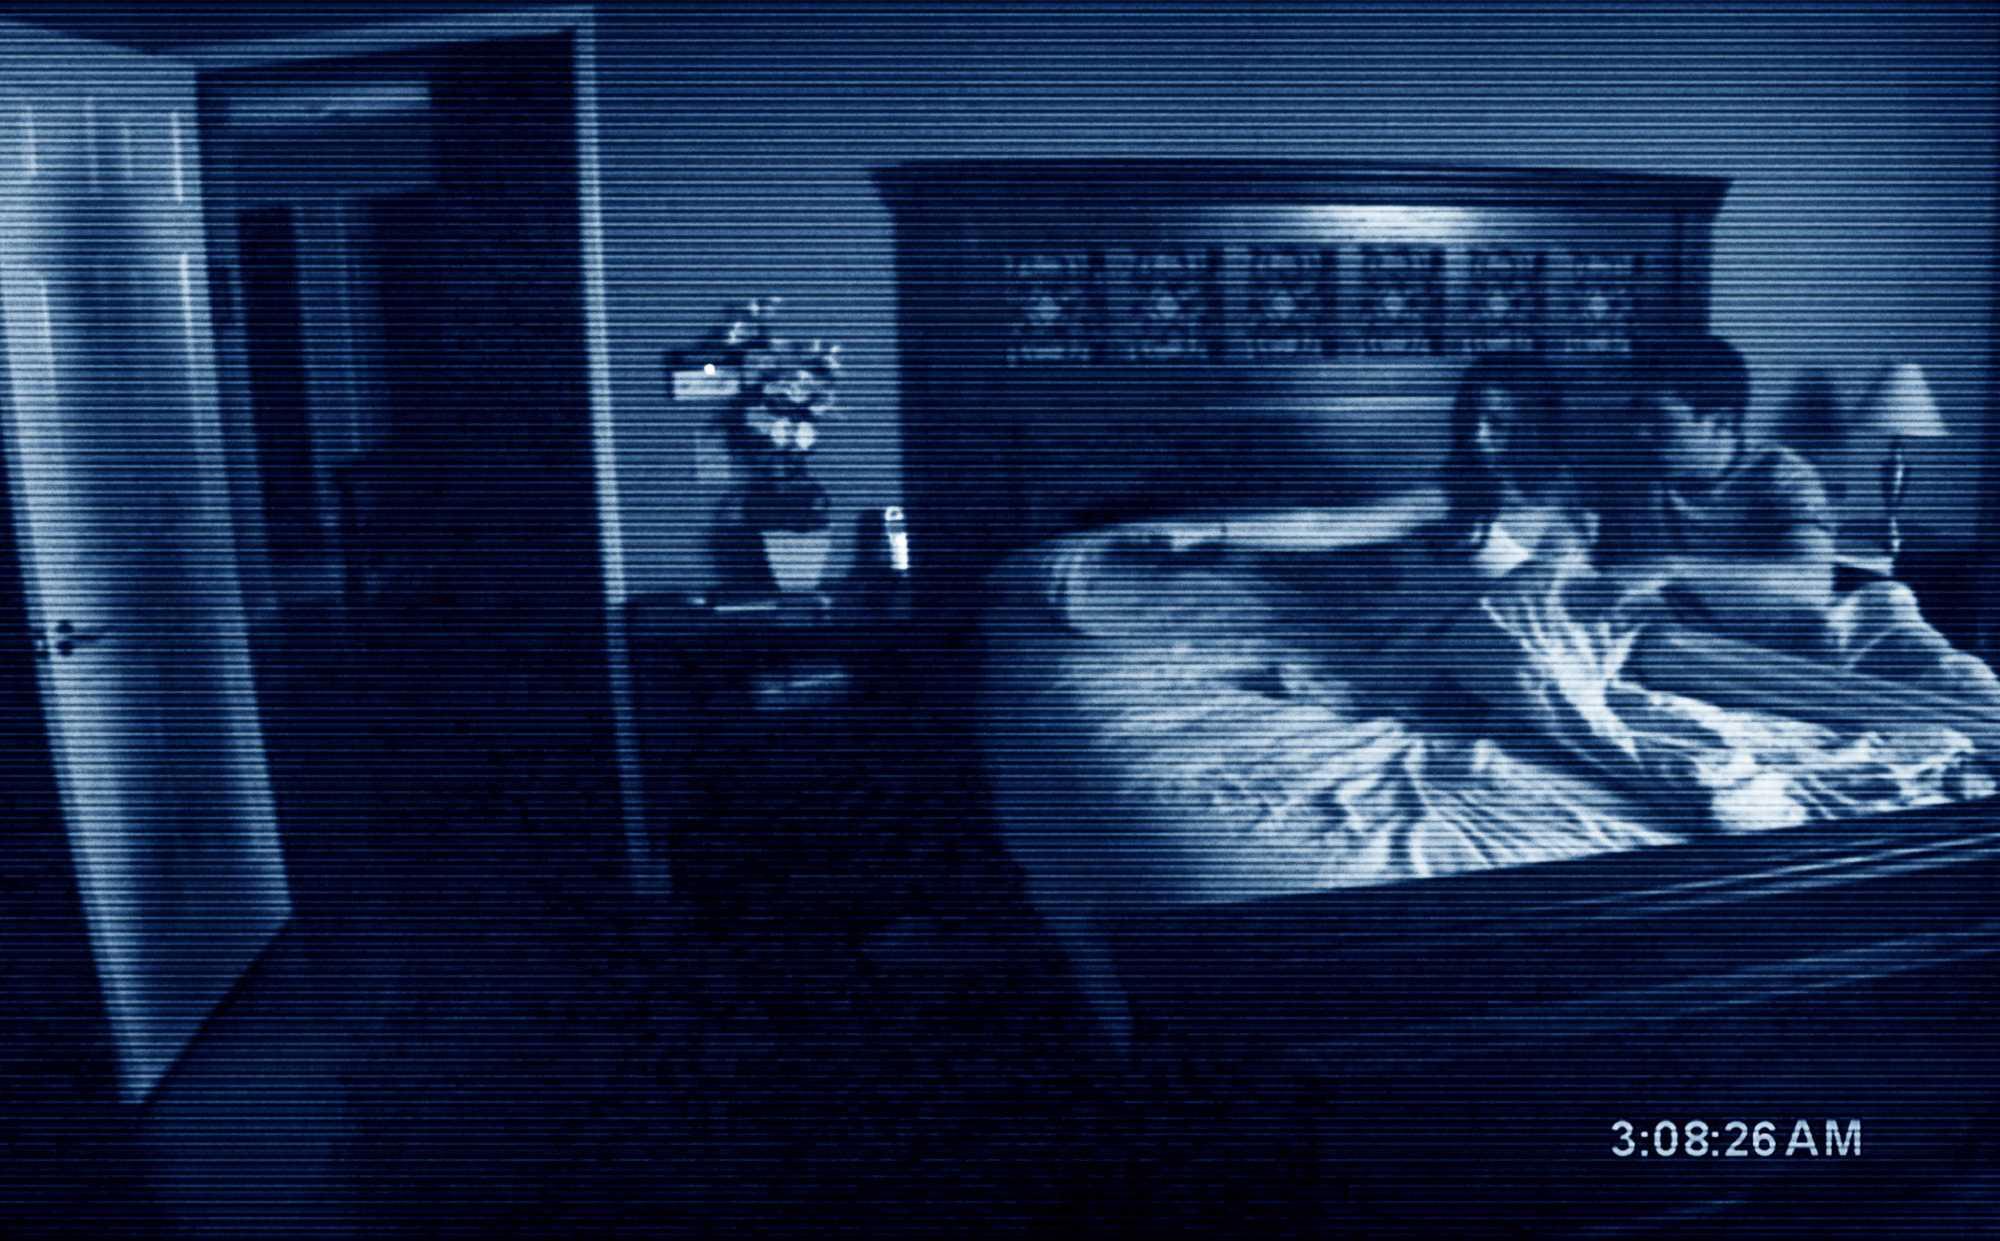 paranormal 1 activity full movie